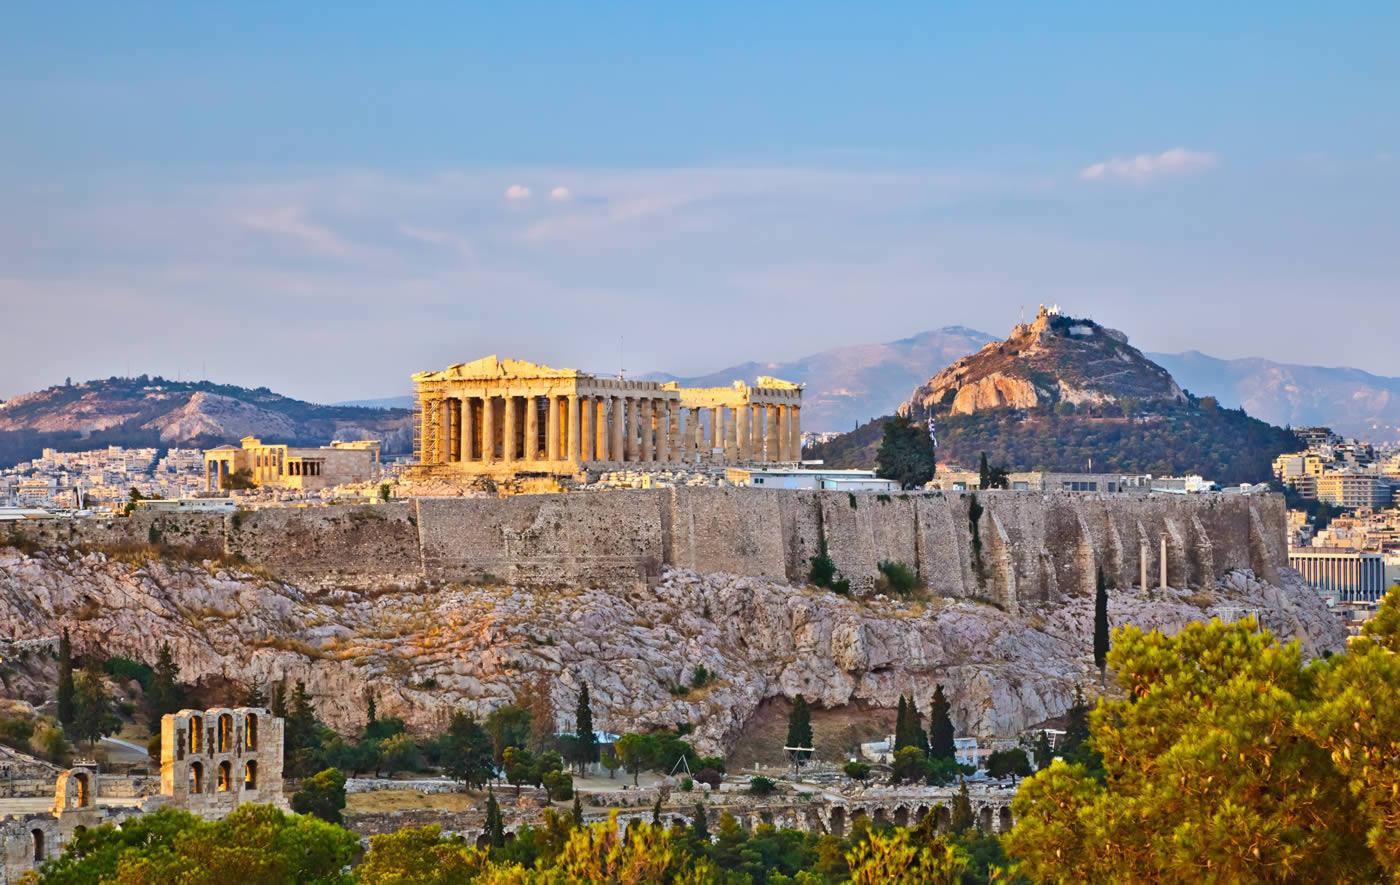 Mic ghid de calatorie – ce sa faci intr-o vacanta in Atena, Grecia, ce sa nu ratezi, atractii turistice